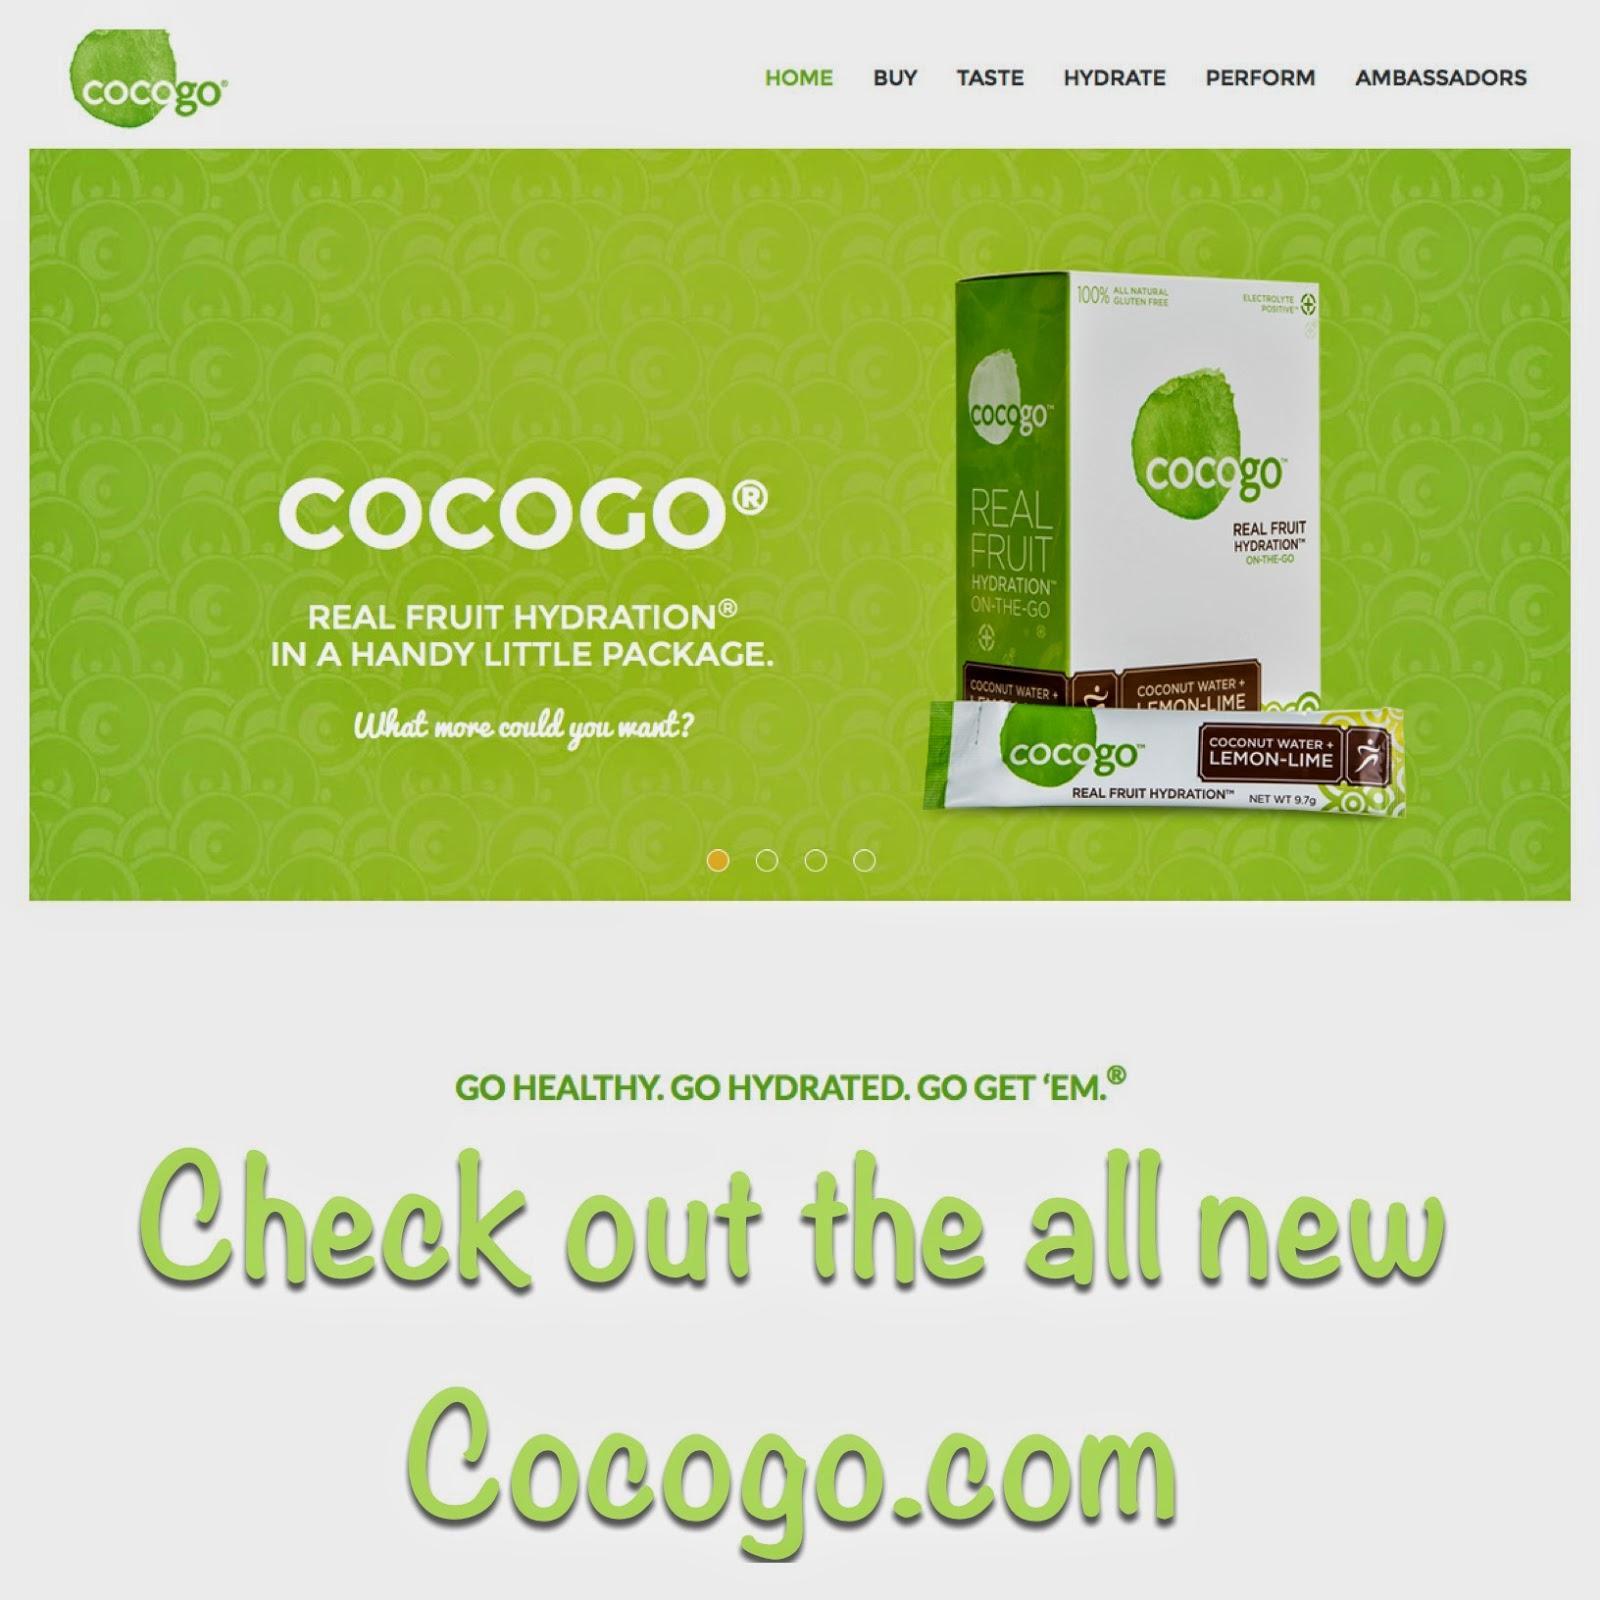 http://www.cocogo.com/index.html#